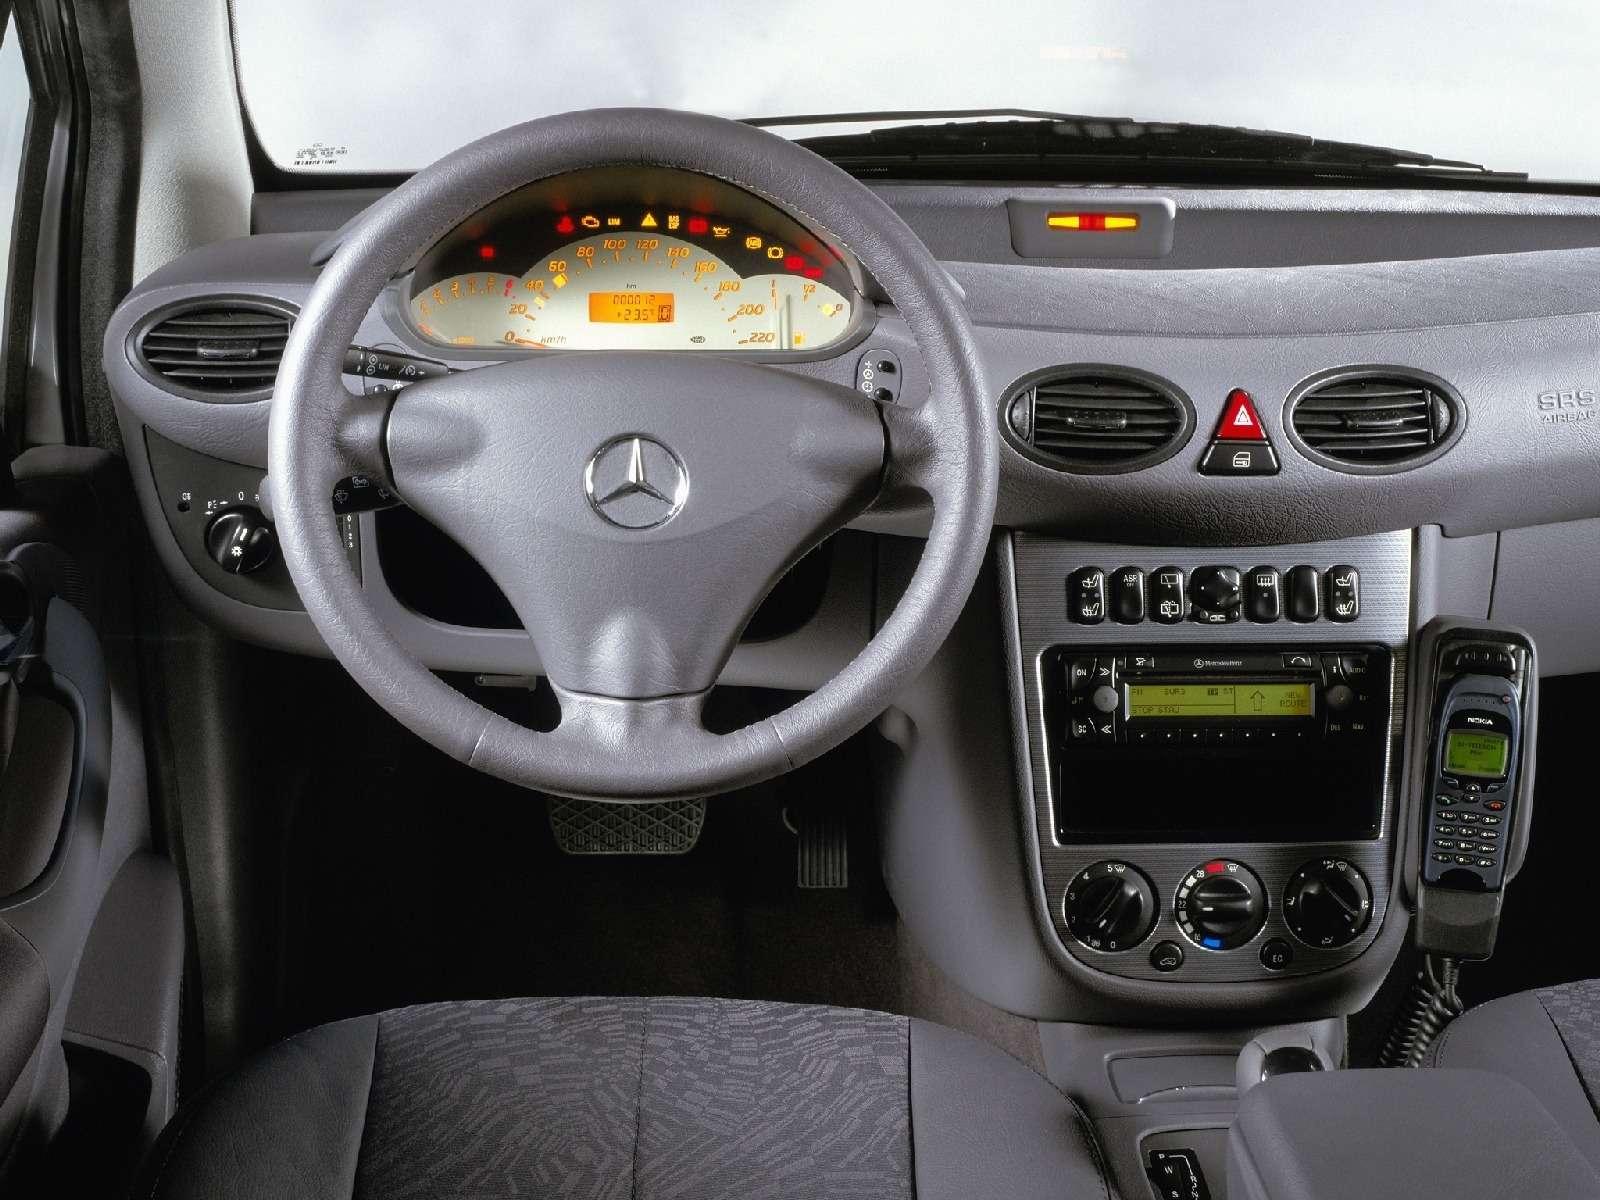 Дитя революции: Mercedes-Benz A-класса празднует 20-летний юбилей— фото 729641